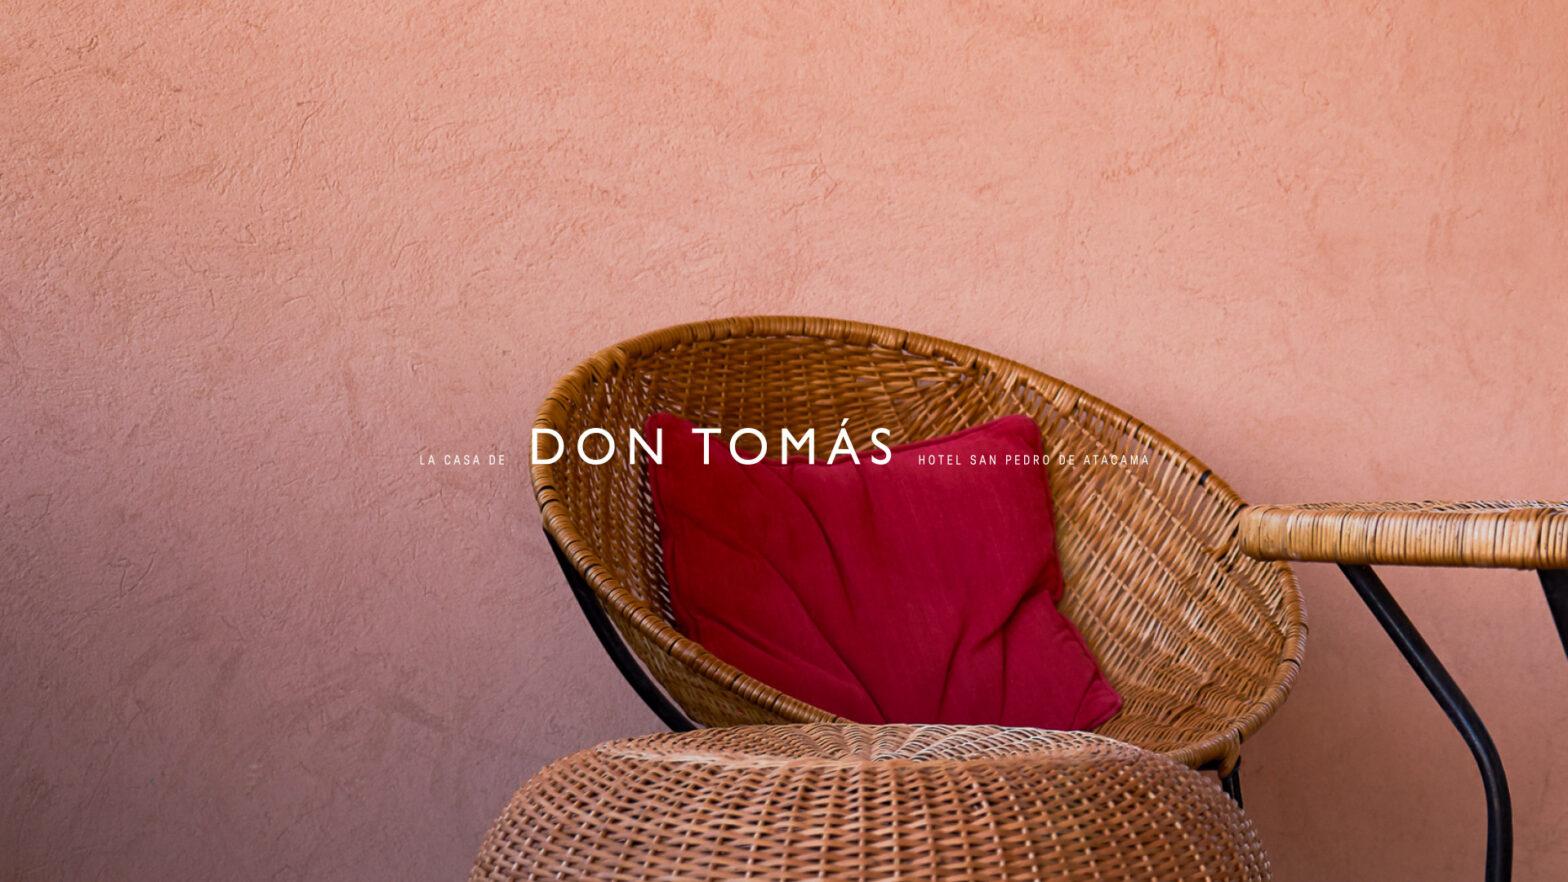 Fotografia Hotel La casa de don tomas con texto